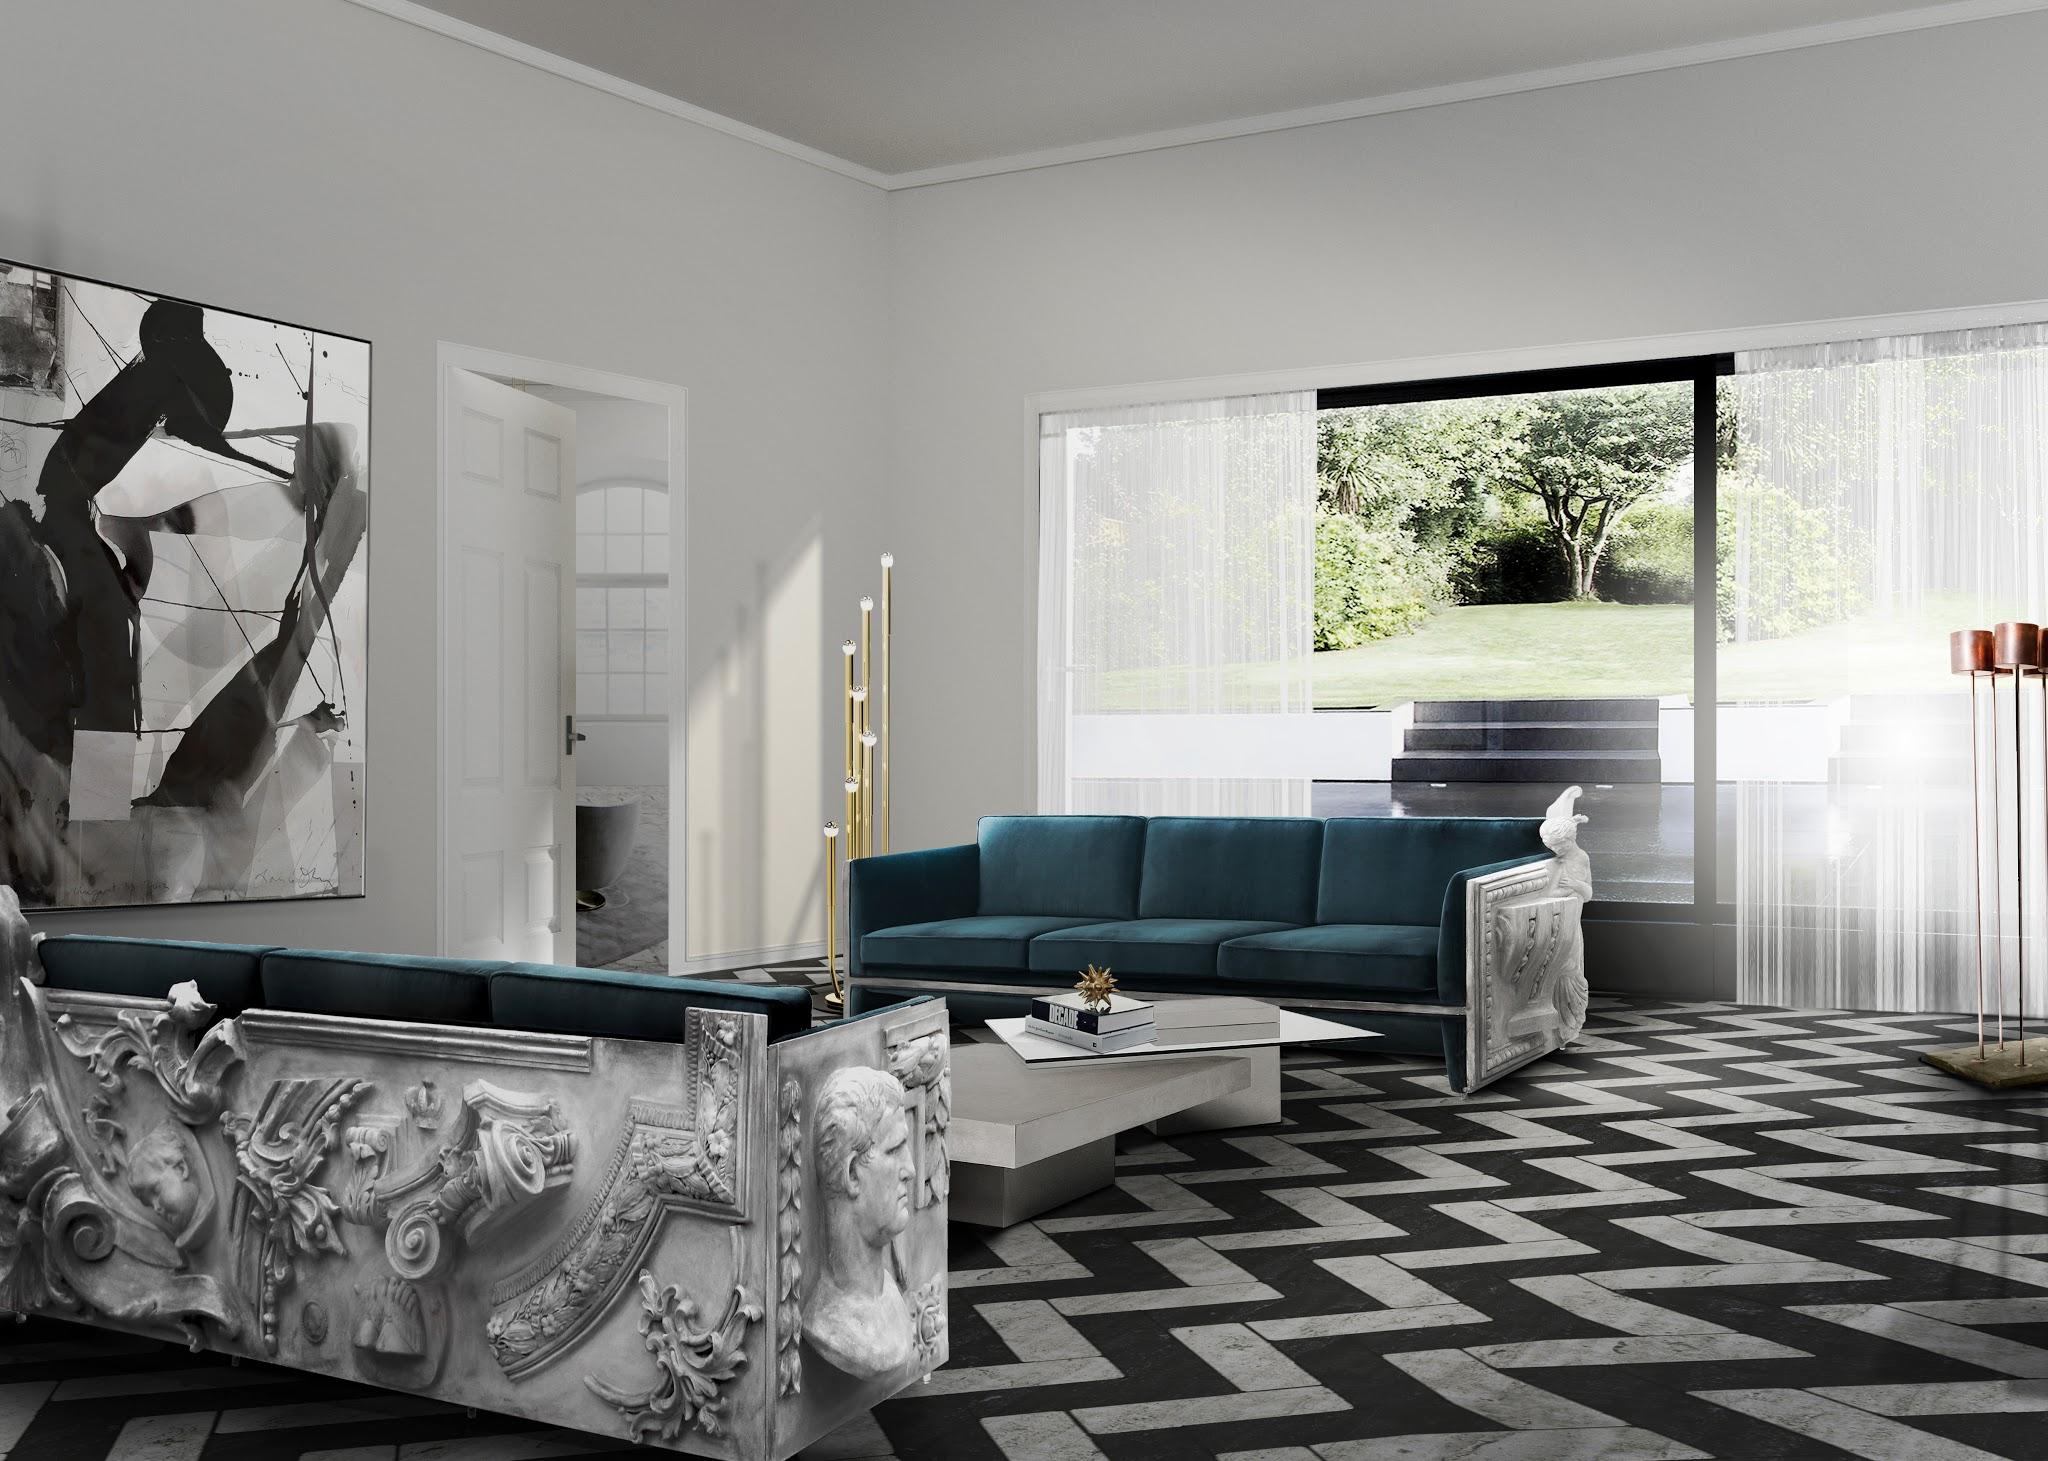 Картинки по запросу 2017 home decor trends интерьер 5 секретов декорирования, которые улучшат любой интерьер what to expect when 2016 comes luxury trends by boca do lobo versailles blue